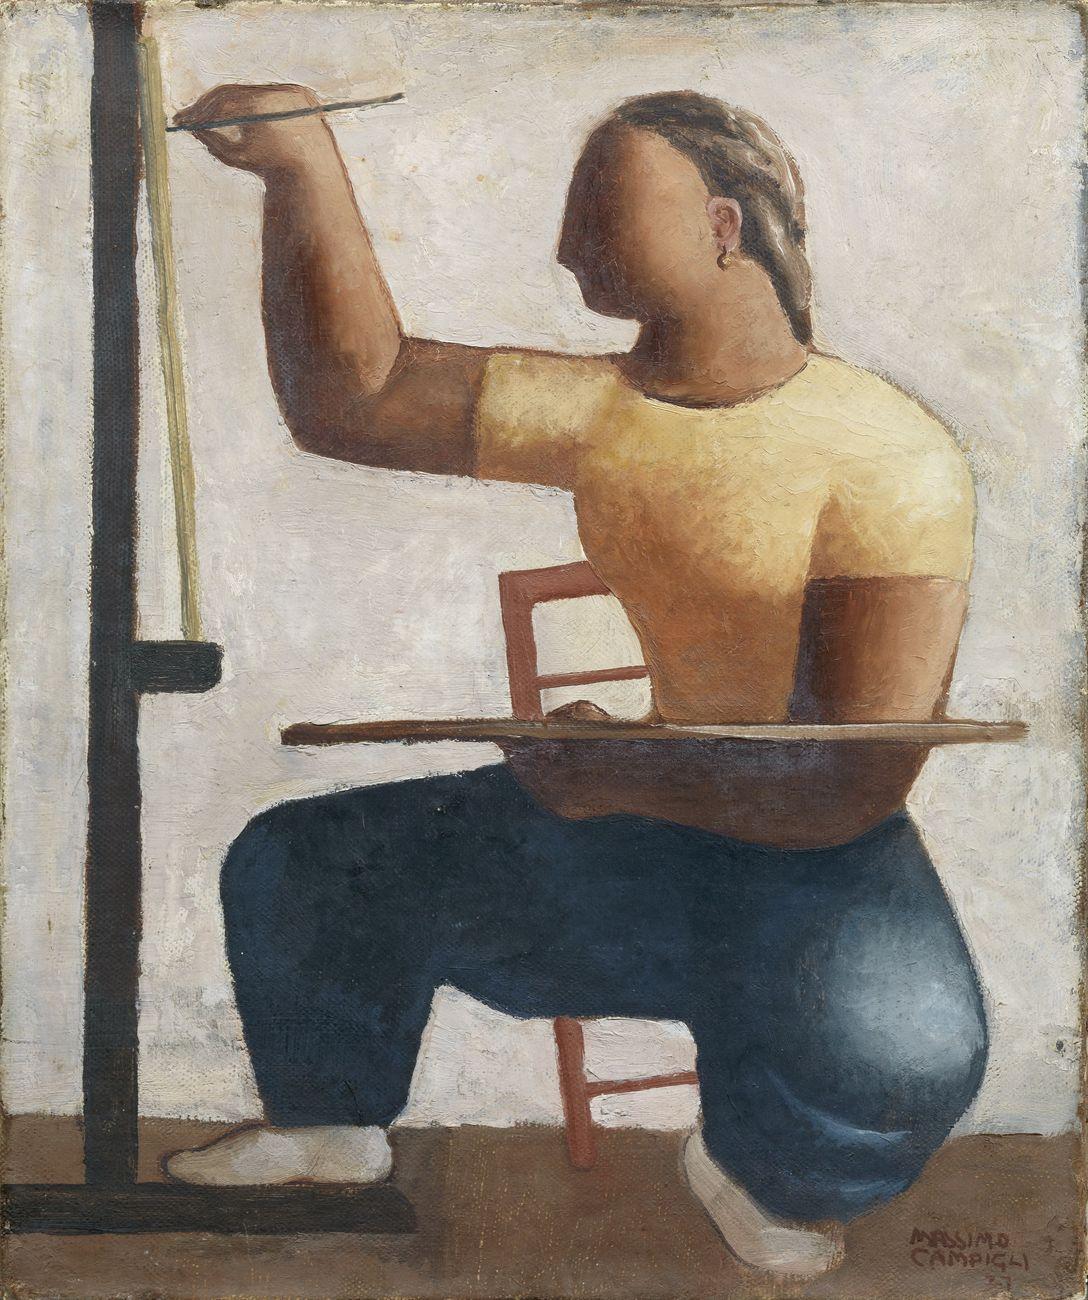 Massimo Campigli, Pittrice, 1927, olio su tela, cm 46,5x38